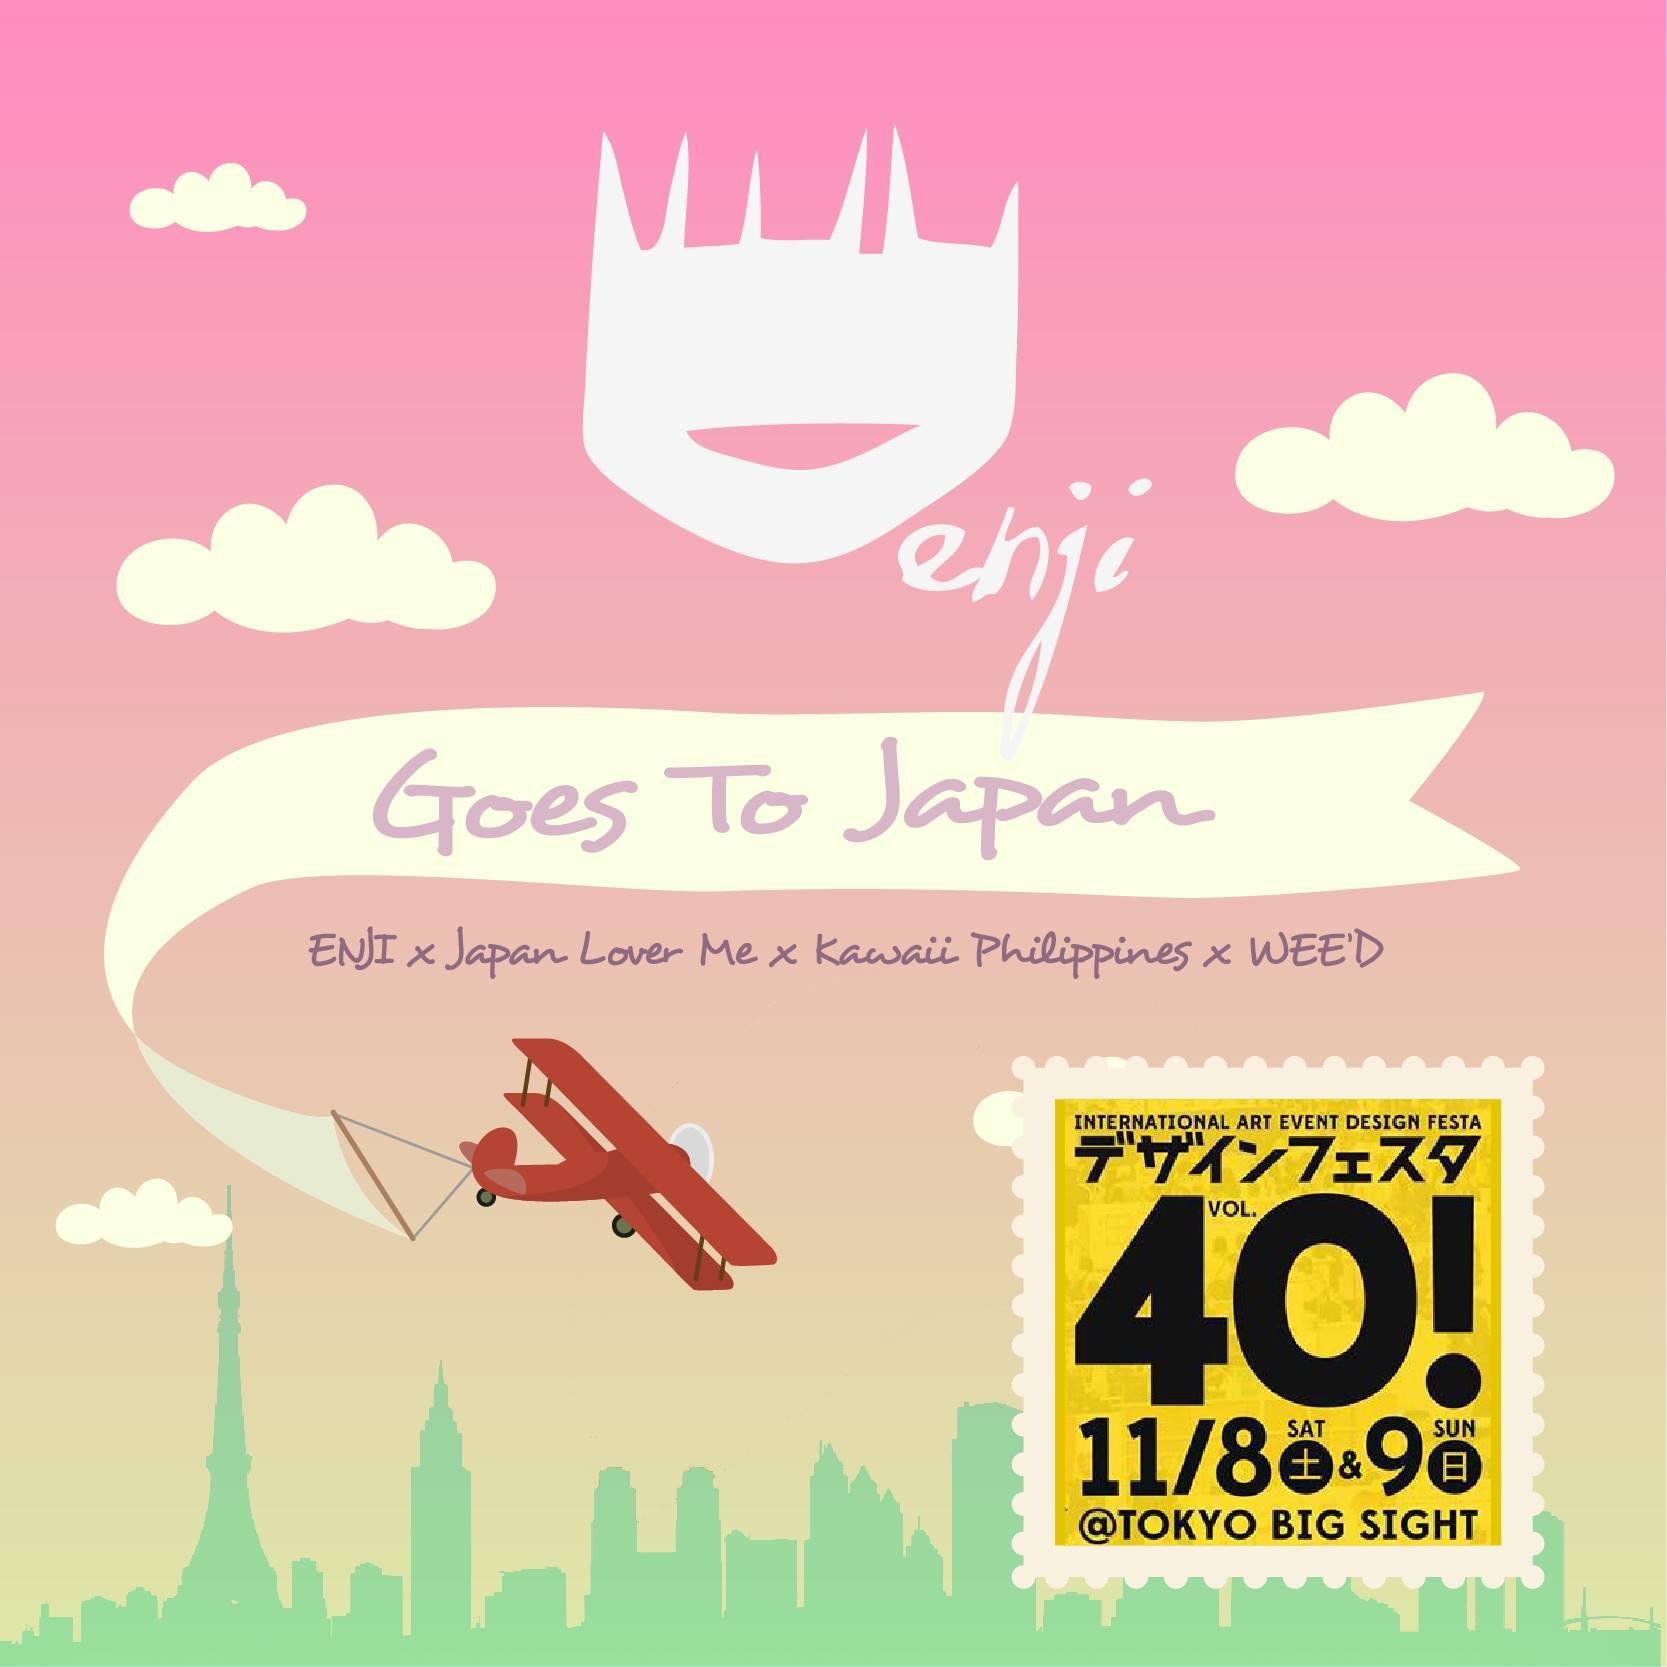 ENJI-goes-to-japan